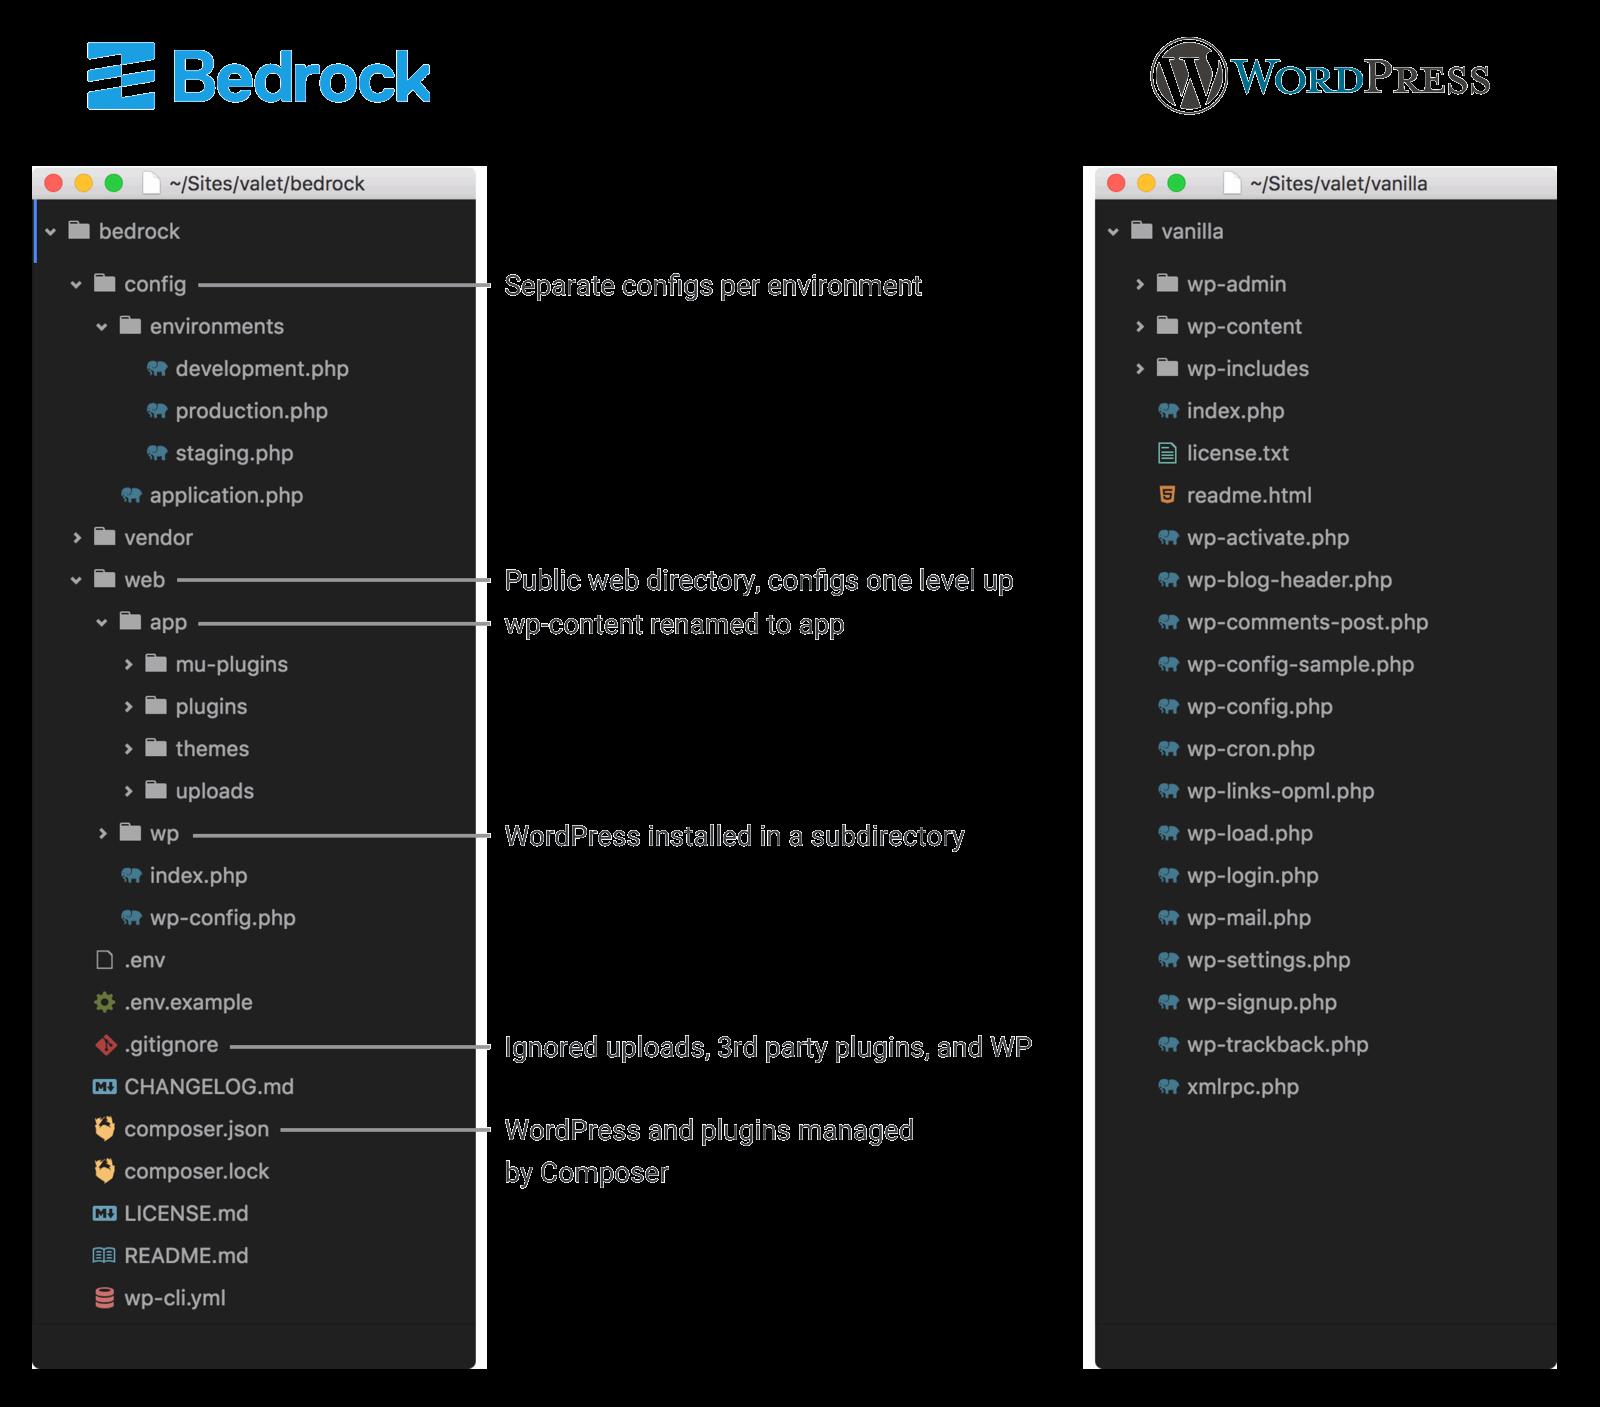 Bedrock par rapport à WordPress